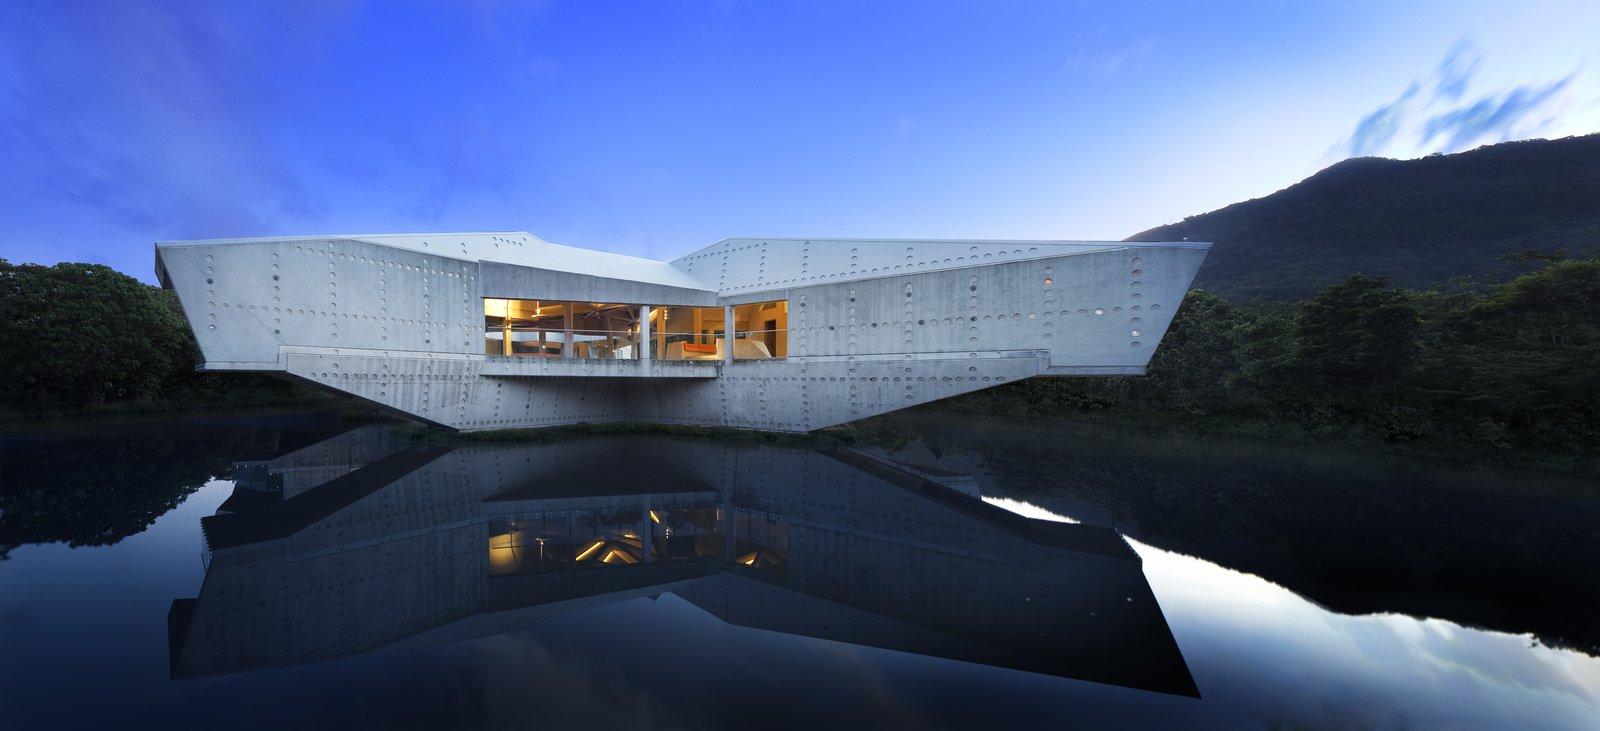 Stamp House (Cape Tribulation, Australia)  Architect: Charles Wright Architects  Category: House Cantilevers by Luke Hopping